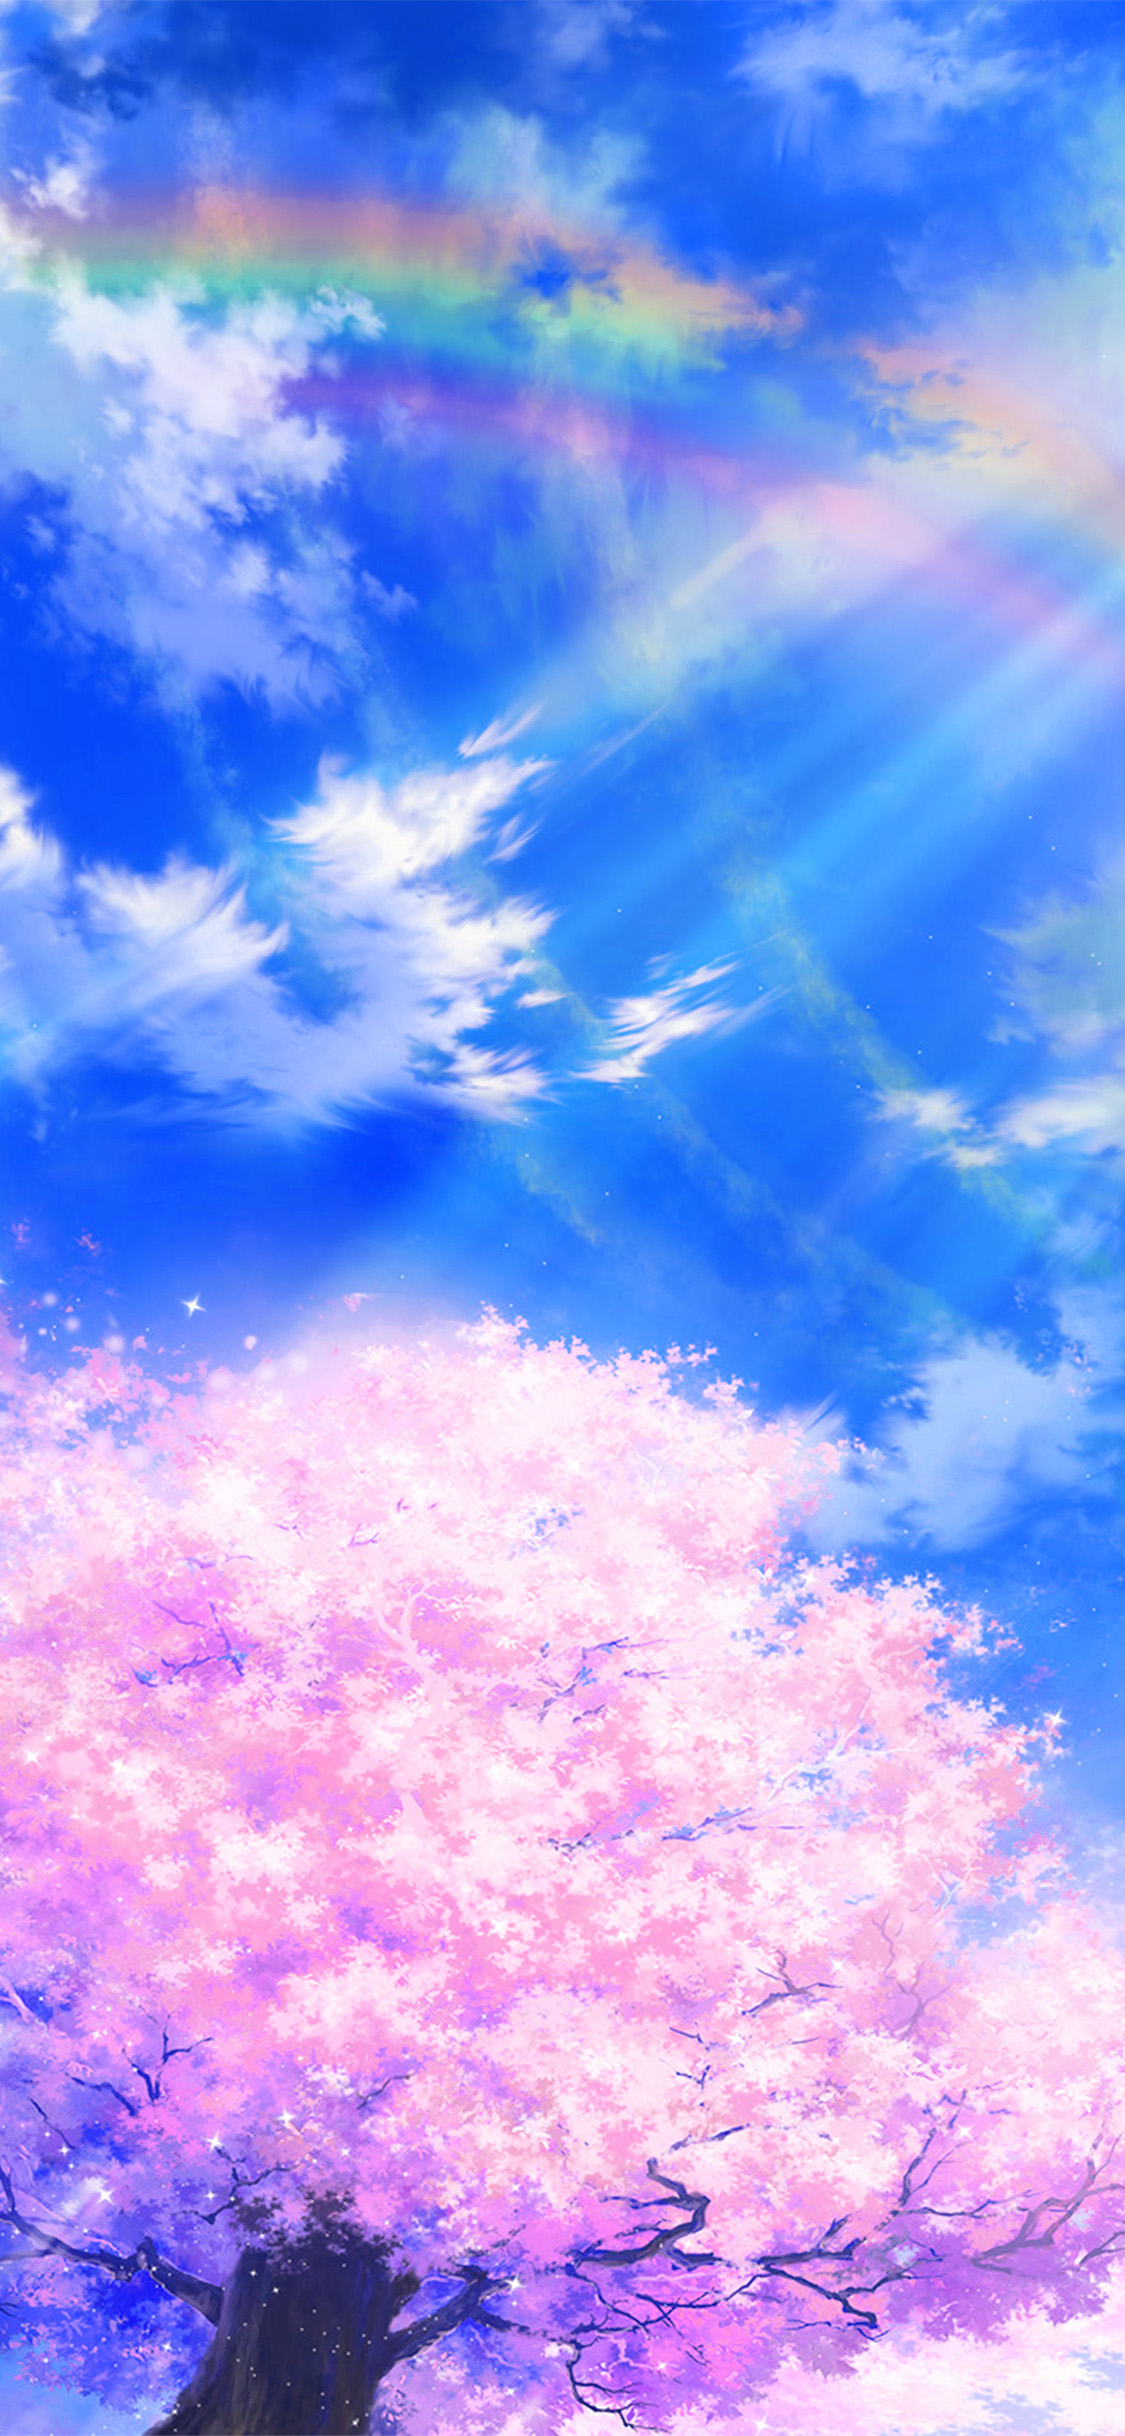 Bd76 Anime Sky Cloud Spring Art Illustration Blue Wallpaper